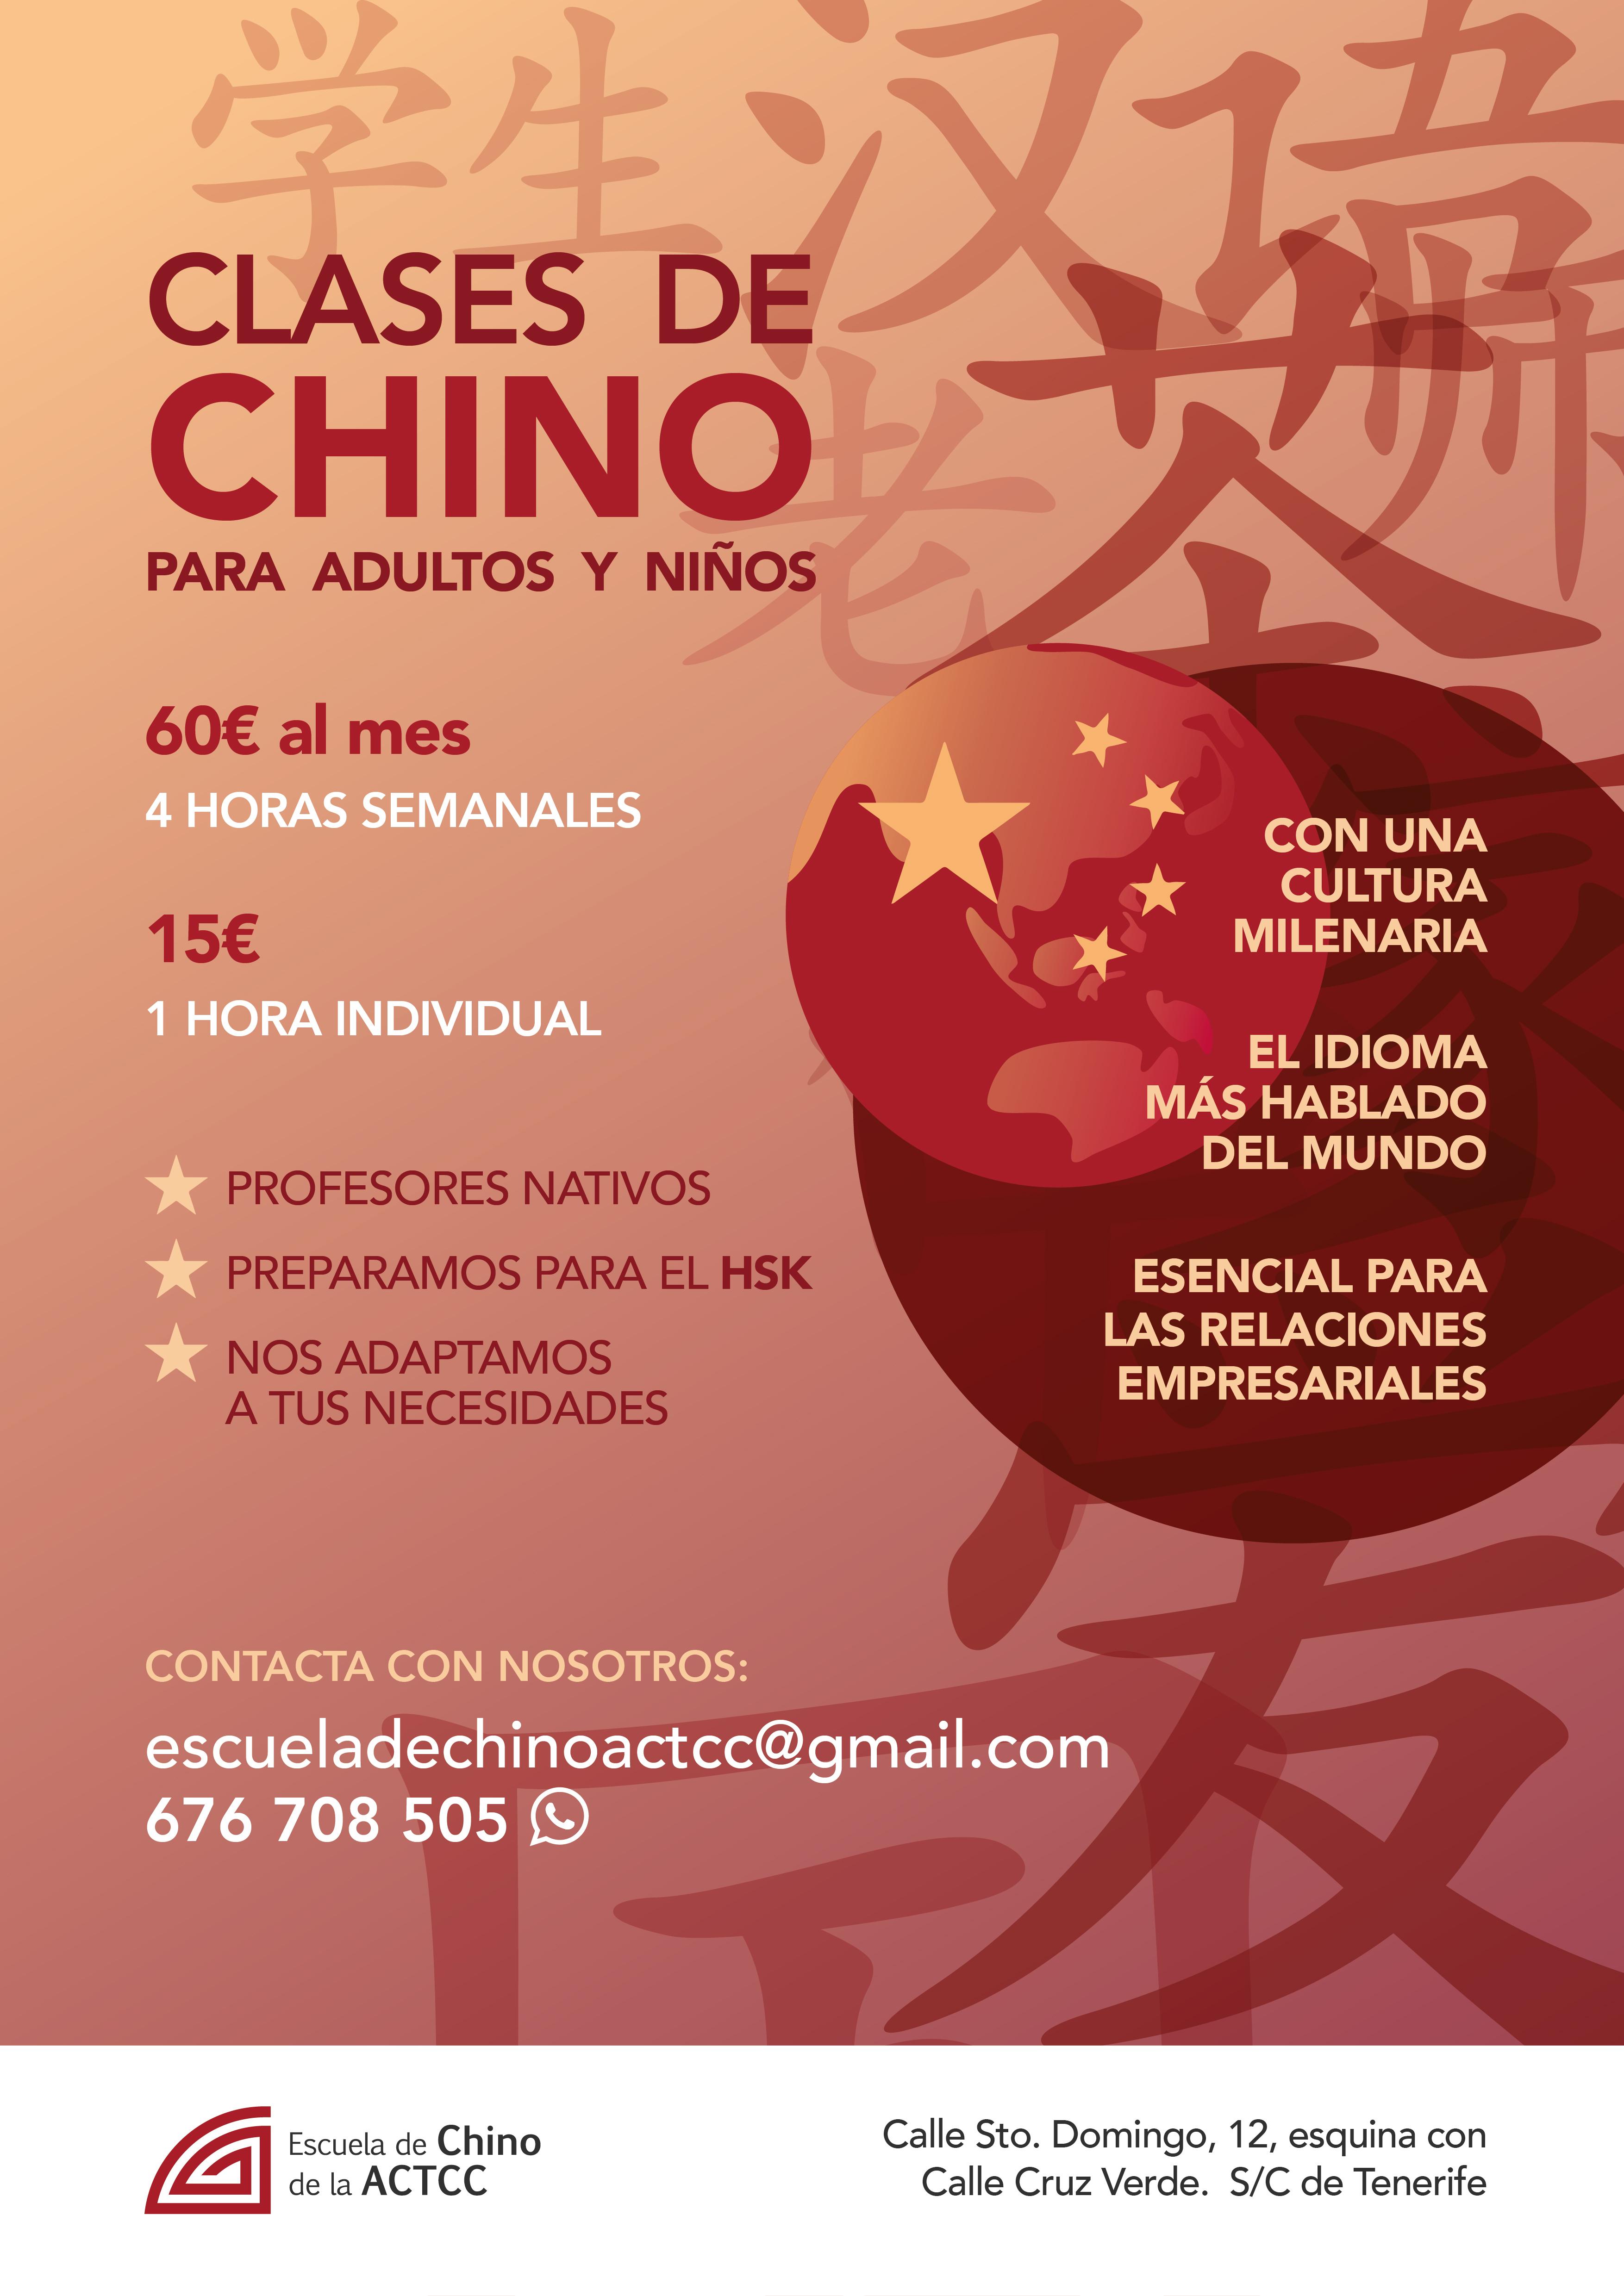 Clases de Chino_ACTCC